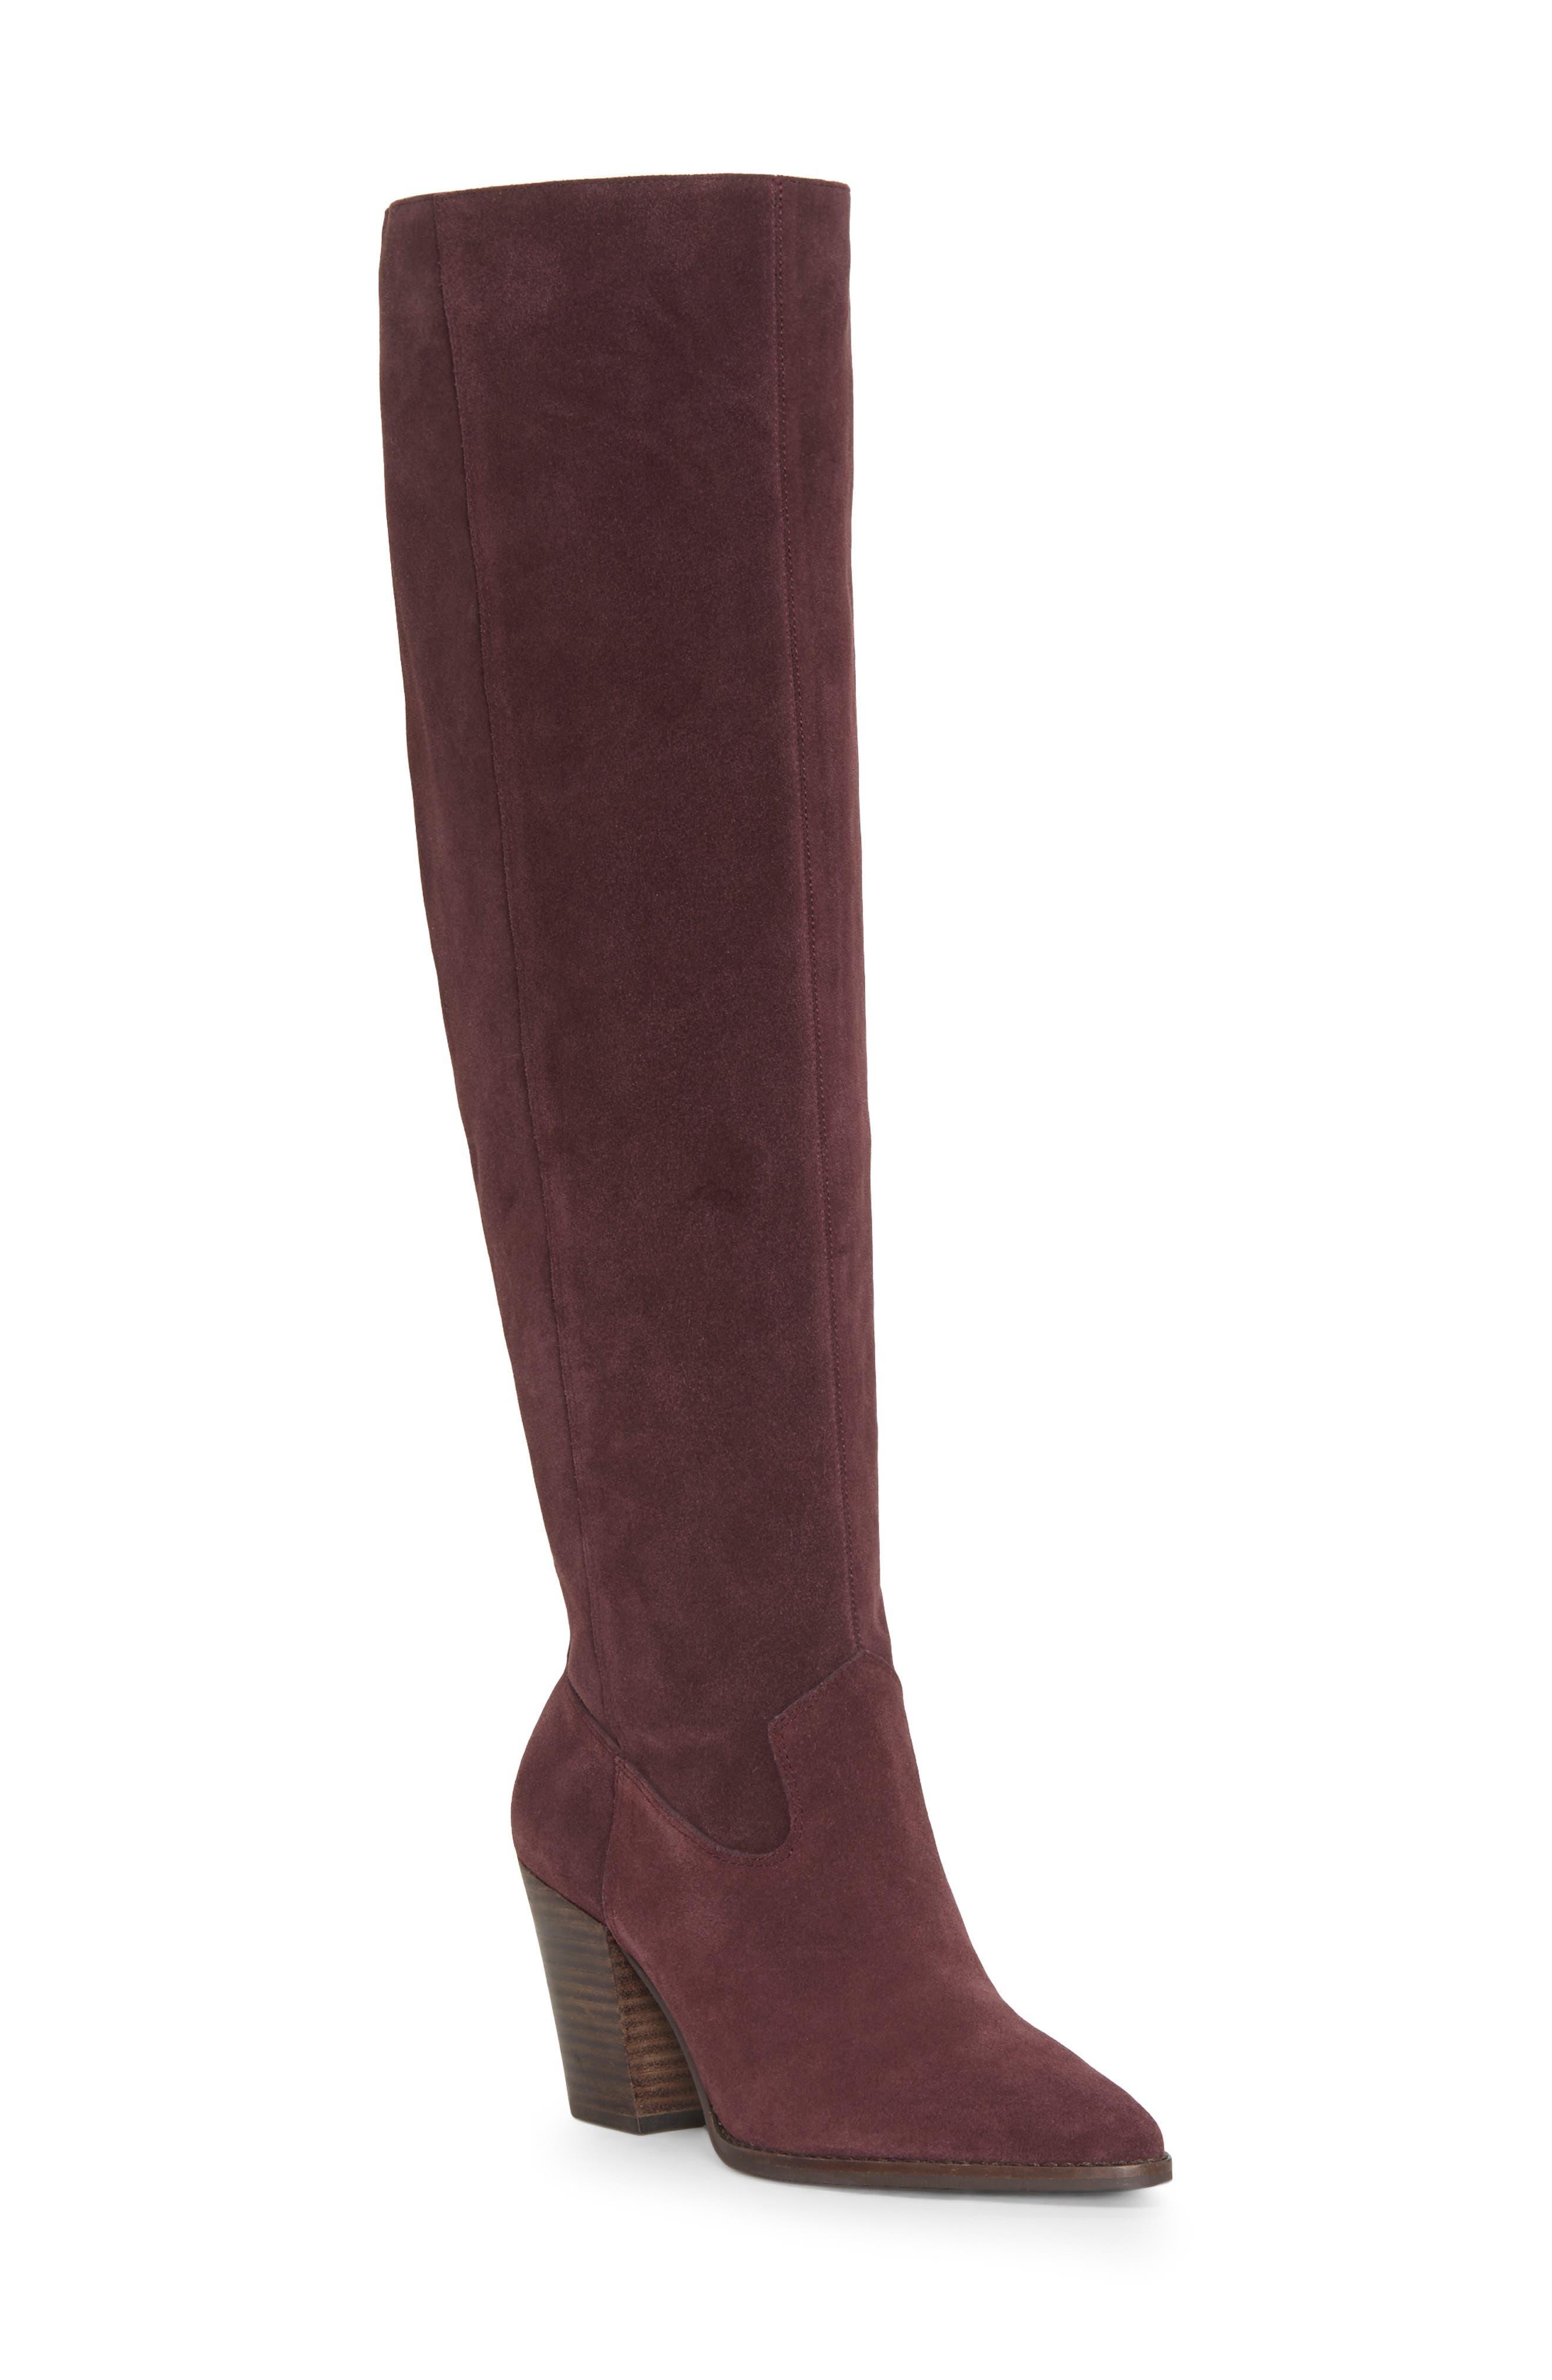 Azoola Knee High Boot, Main, color, RAISIN SUEDE